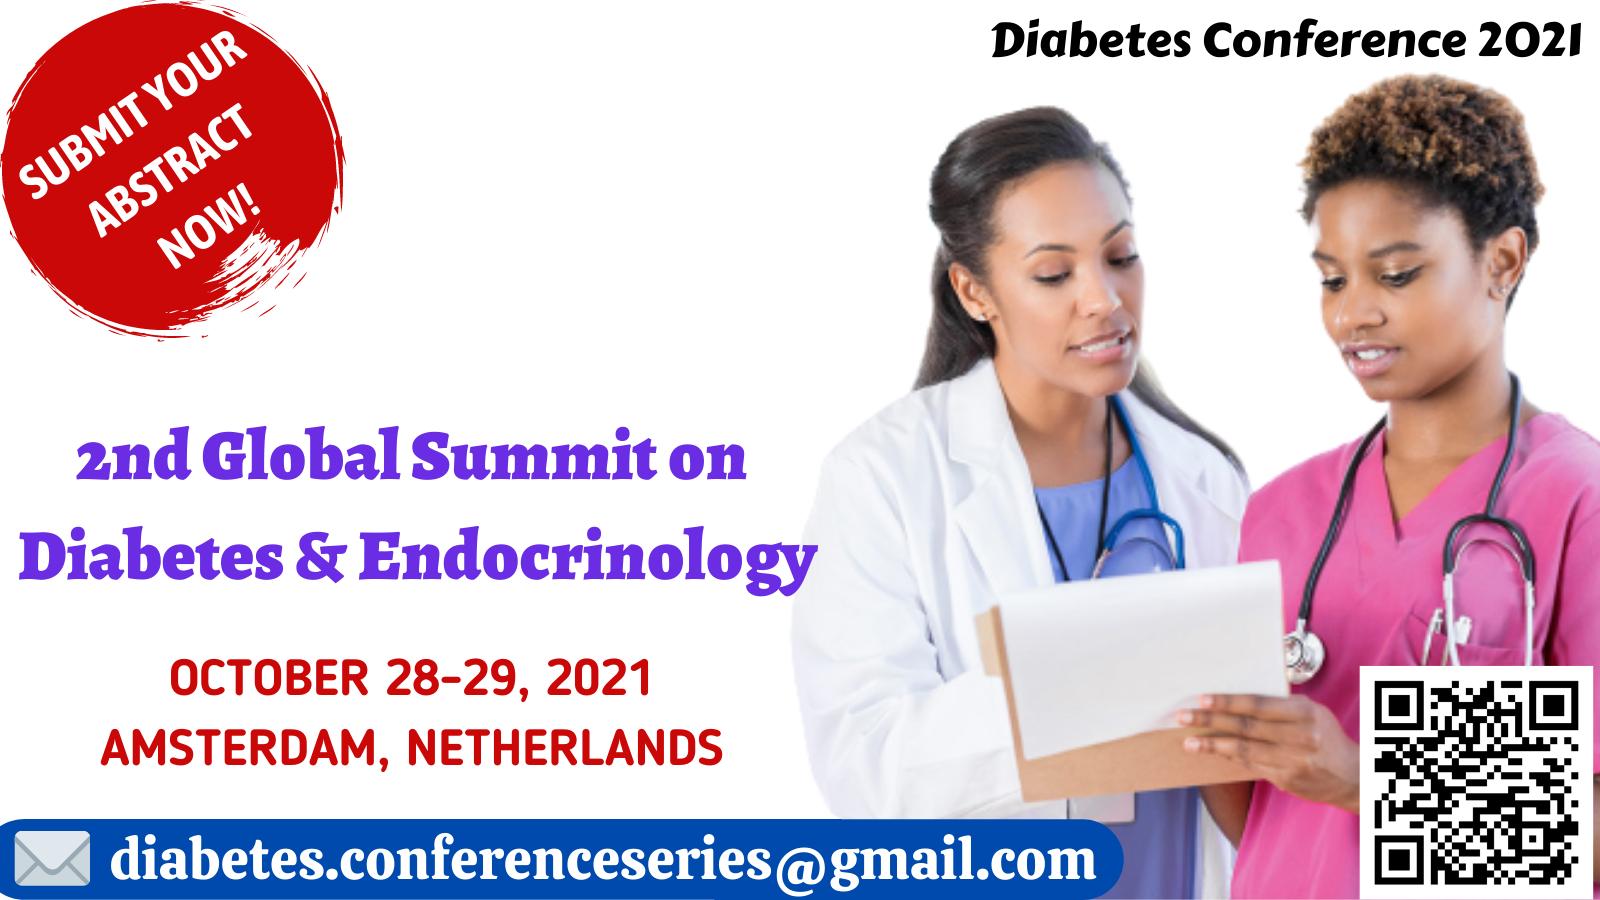 2nd Global Summit on Diabetes & Endocrinology